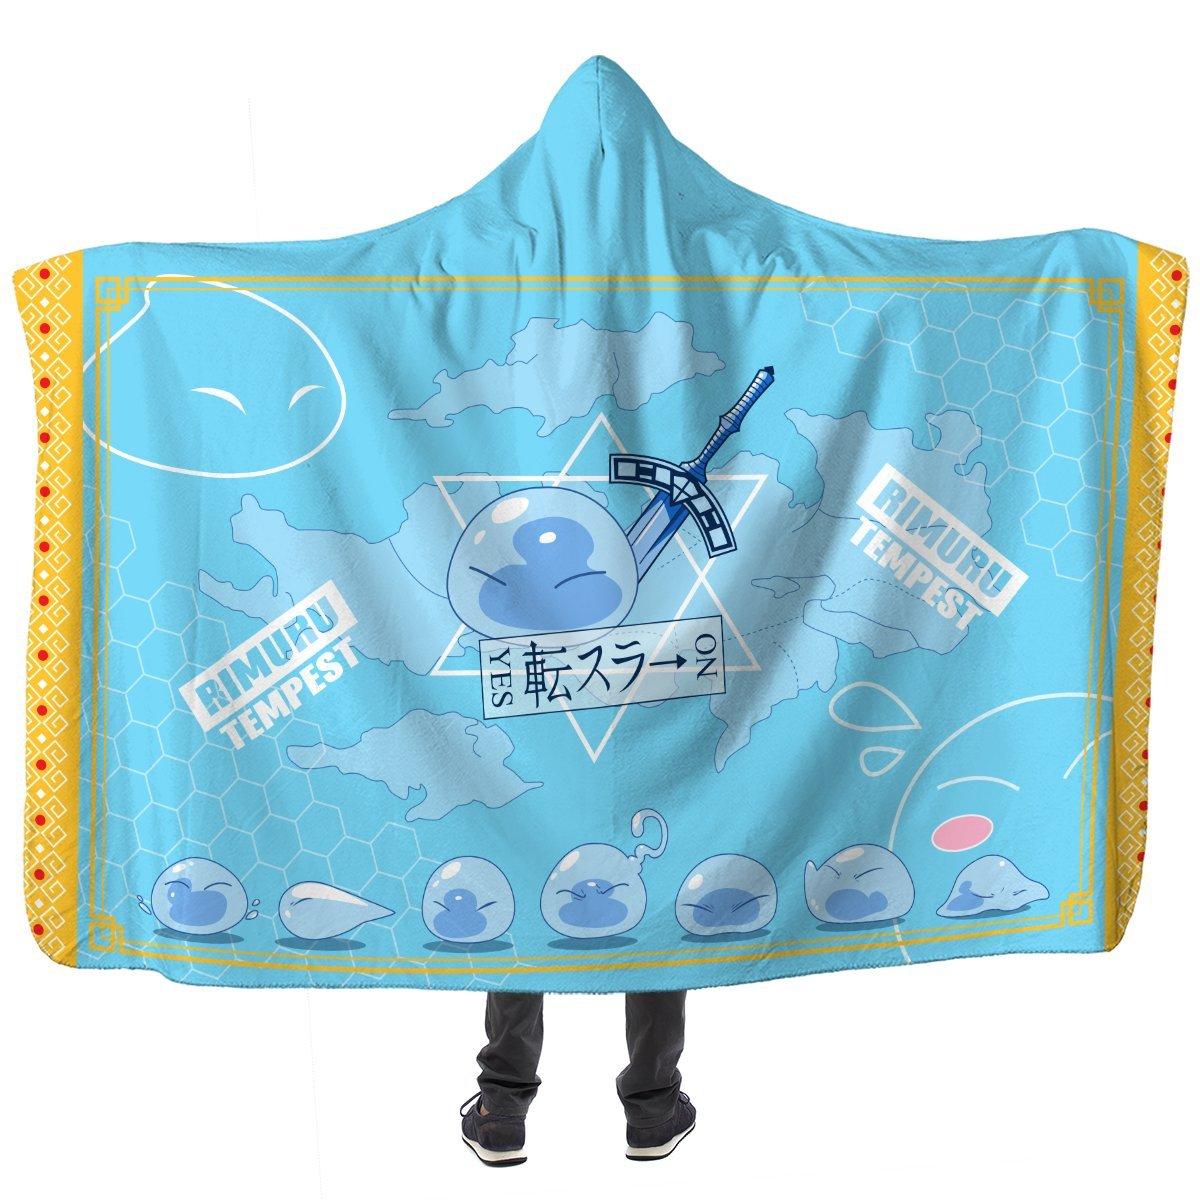 Great Demon Lord Hooded Blanket Official Merch FDM3009 Child Official Otaku Treat Merch